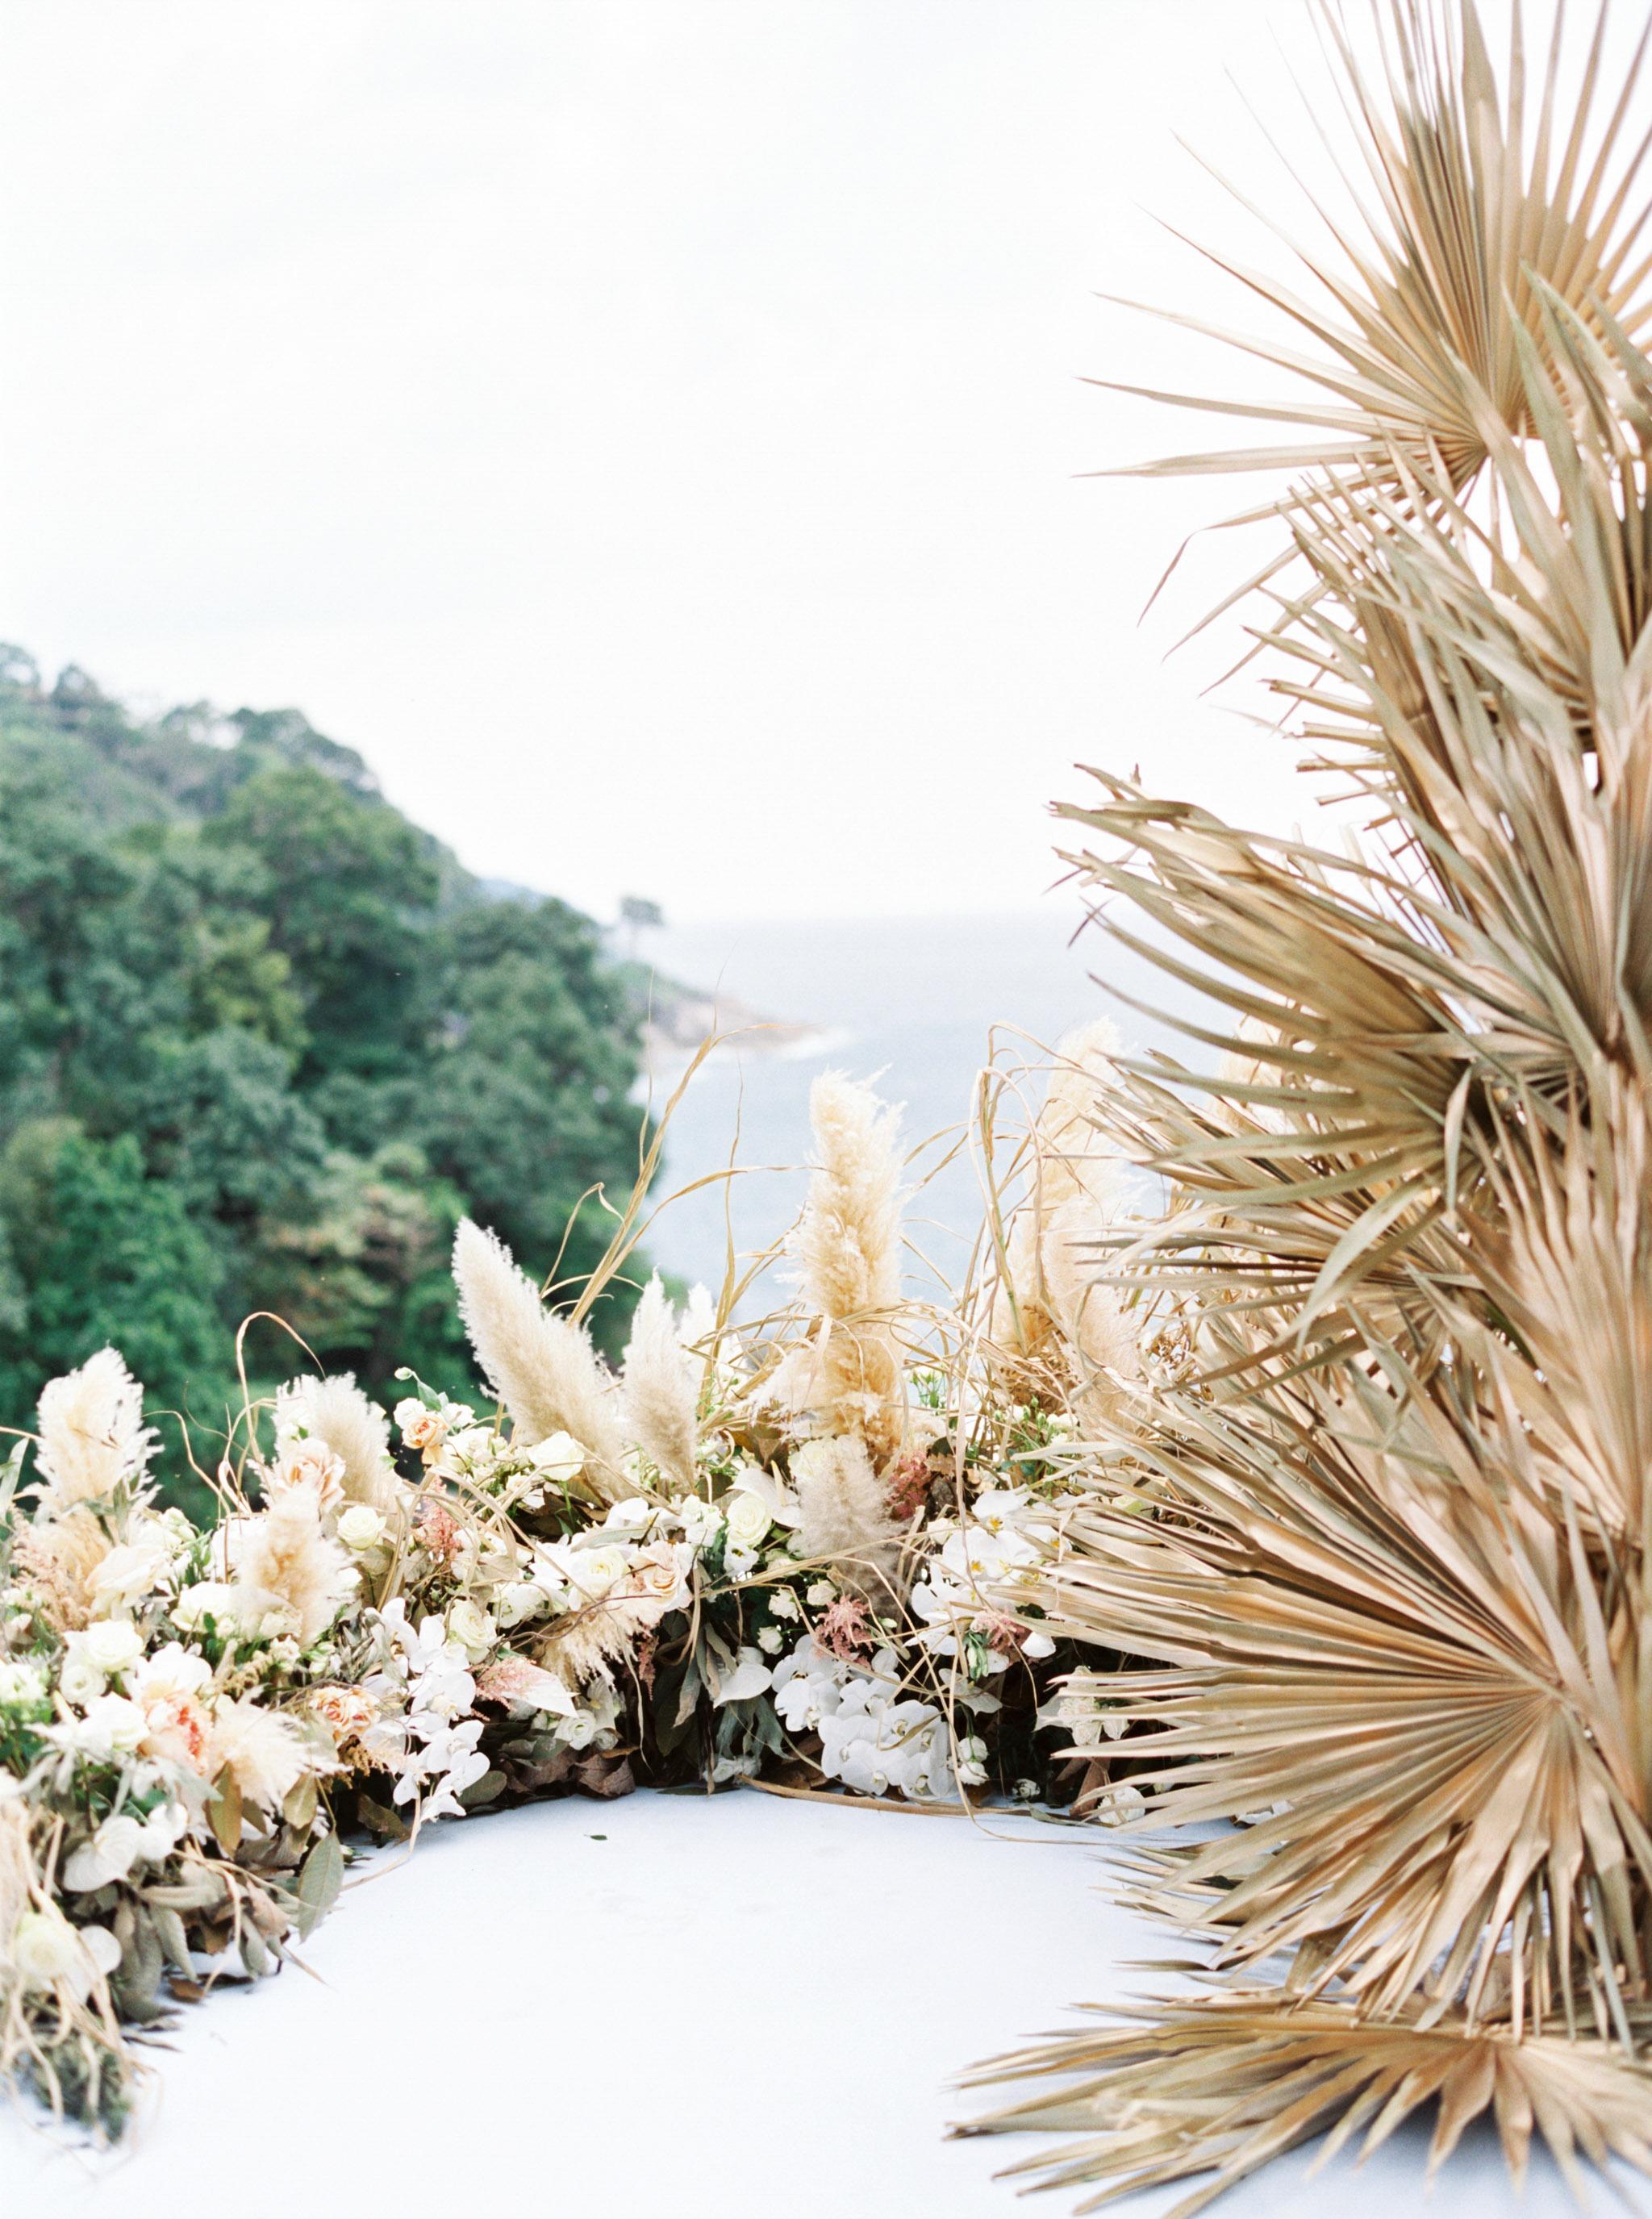 Destination Wedding at The Aquila Luxury Villas in Phuket Thailand Fine Art Film Wedding Photographer Sheri McMahon-00011-11.jpg